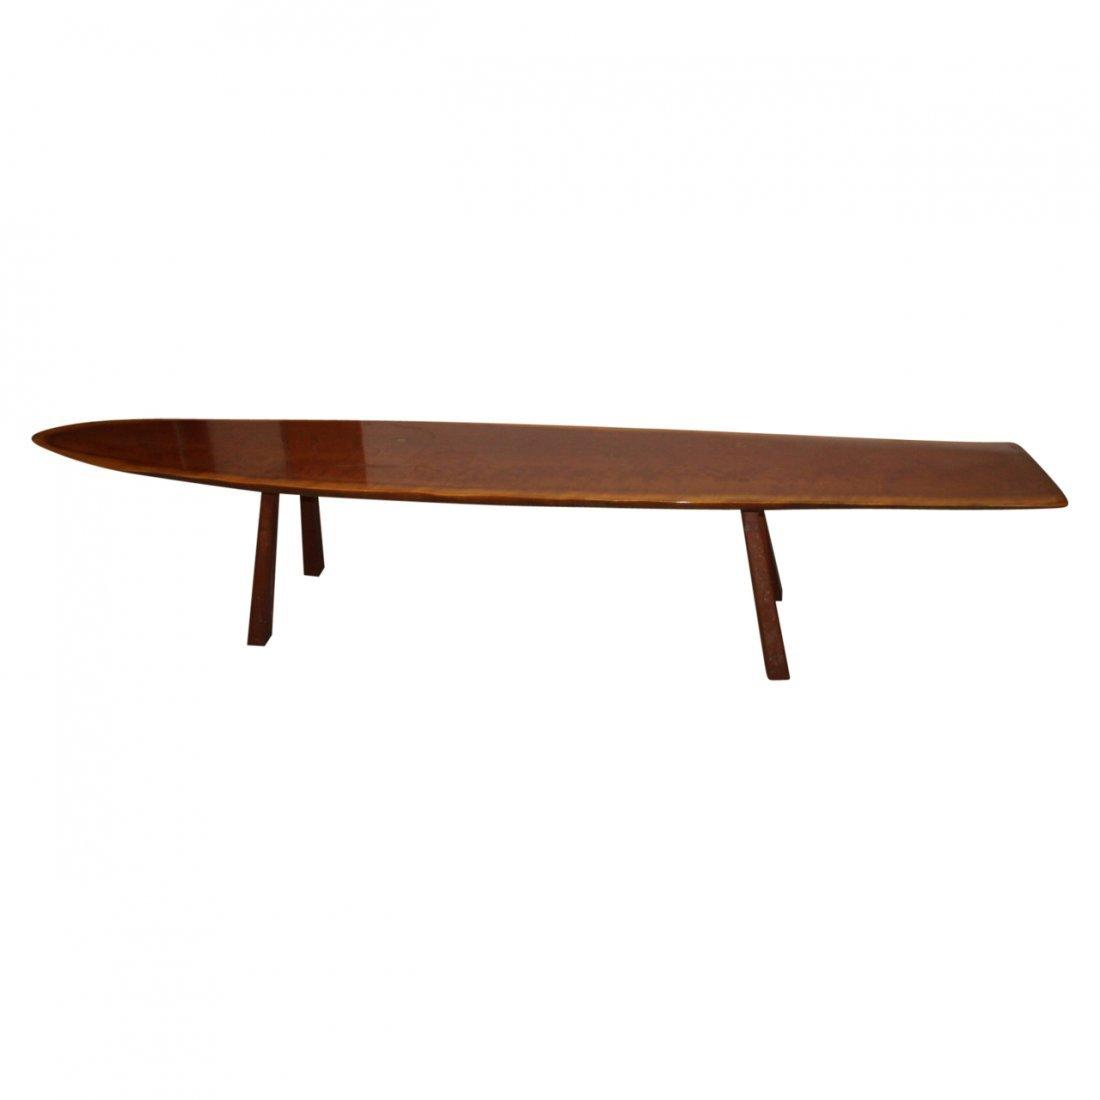 Rare MCM Surfboard Coffee Table